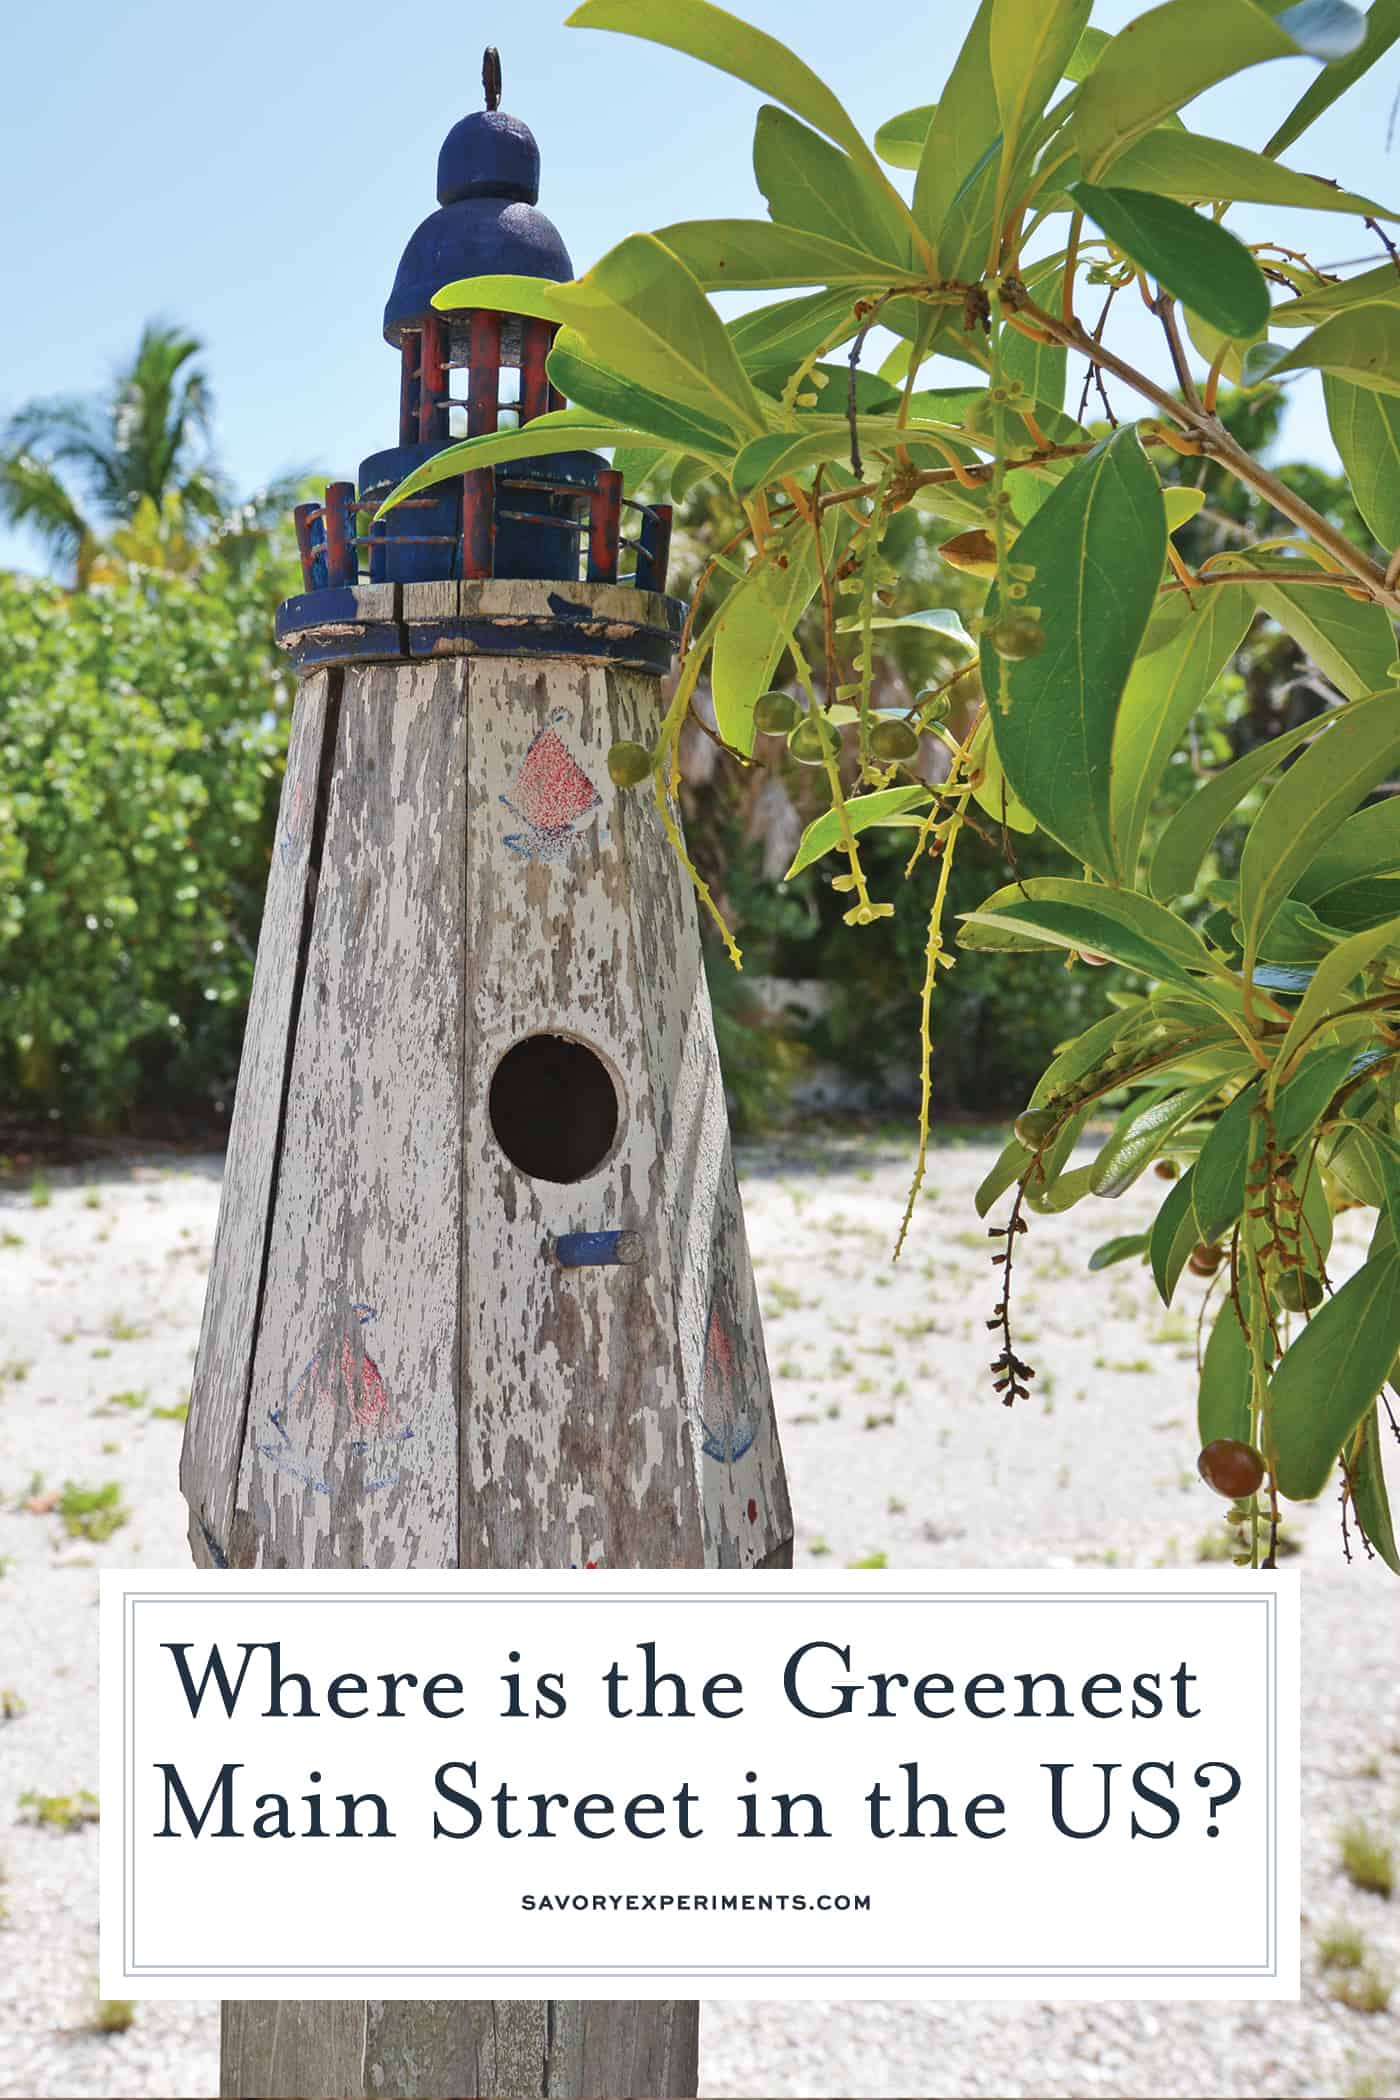 Pine Avenue on Anna Maria Island is The Greenest Main Street in America #annamariaisland #visitflorida www.savoryexperiments.com